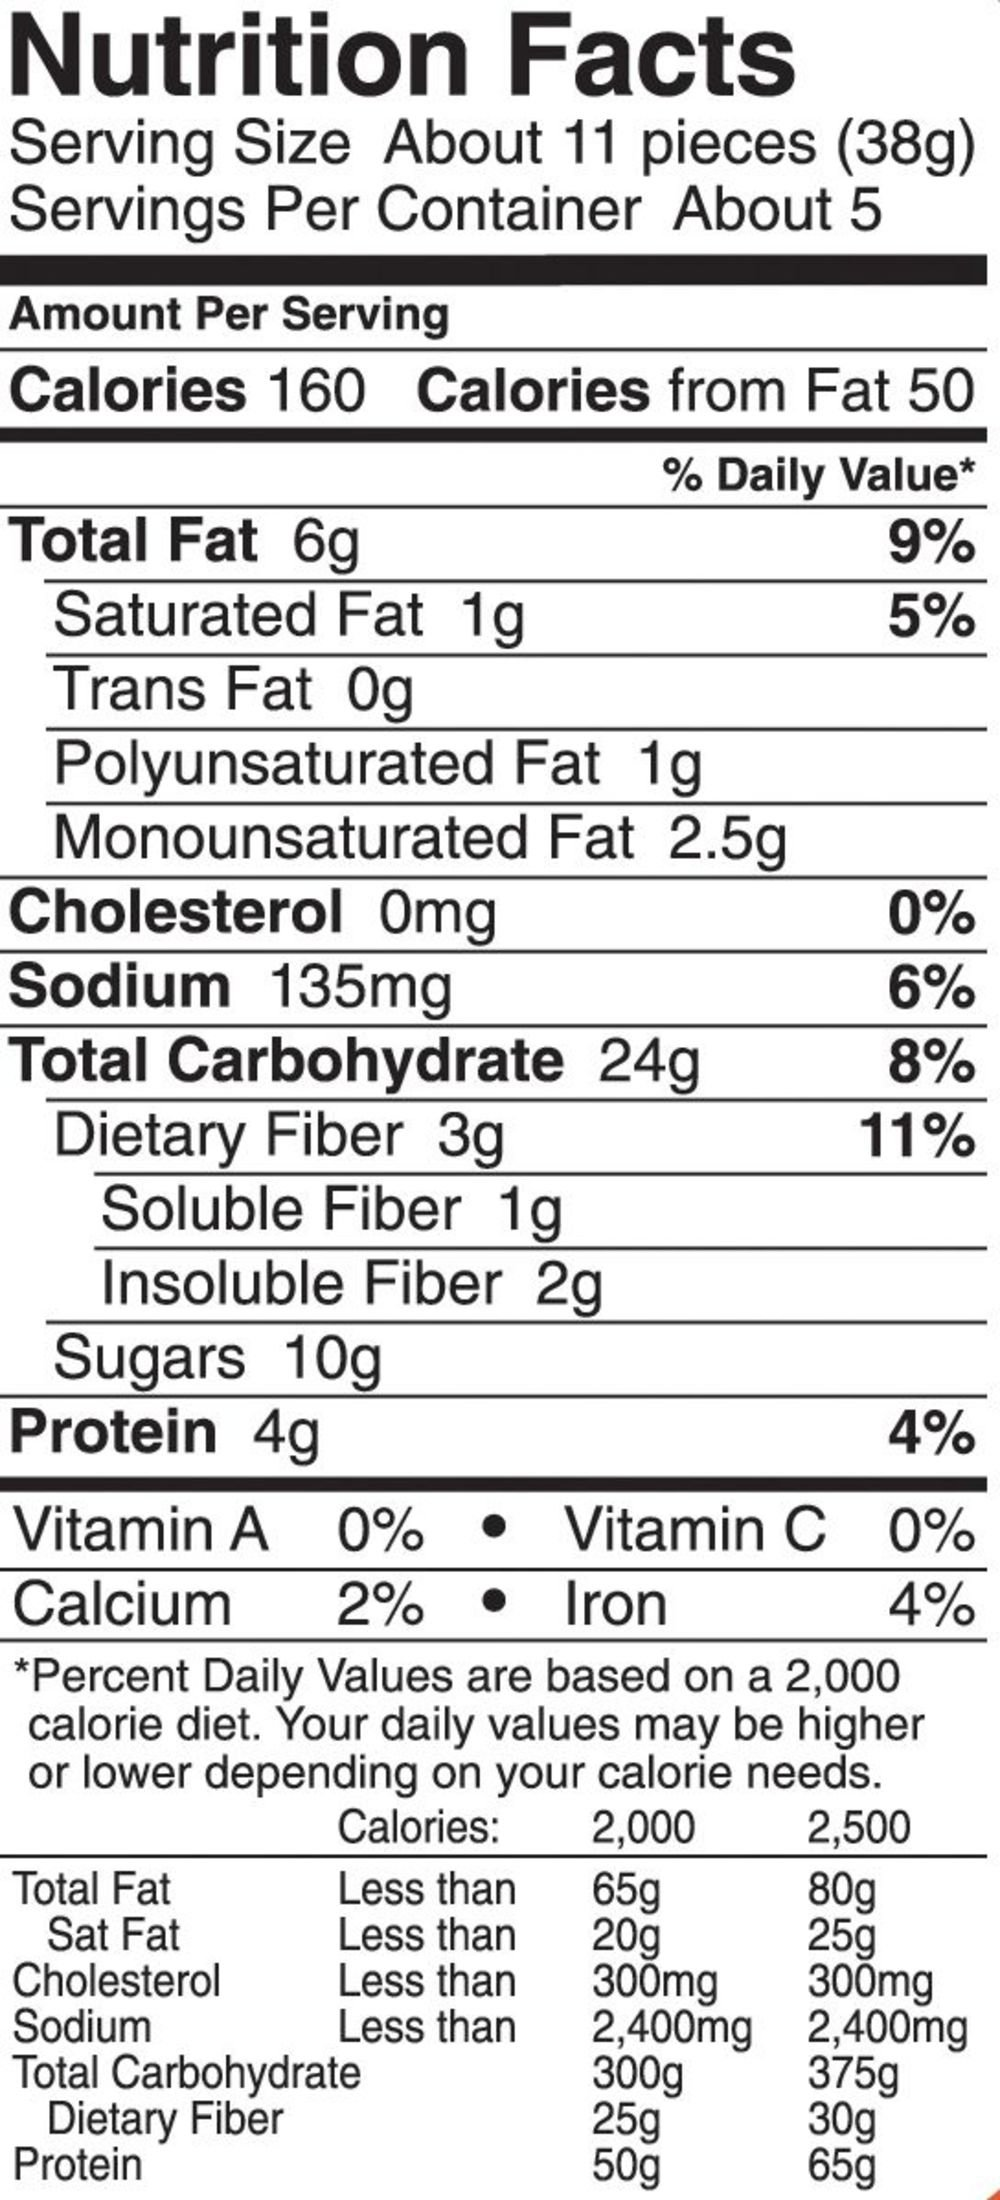 Bear Naked Trail Mix & Dark Chocolate Granola Bites - Gluten Free | Non-GMO | Kosher | Vegan - 7.2 Oz (6Count) by Bear Naked (Image #3)